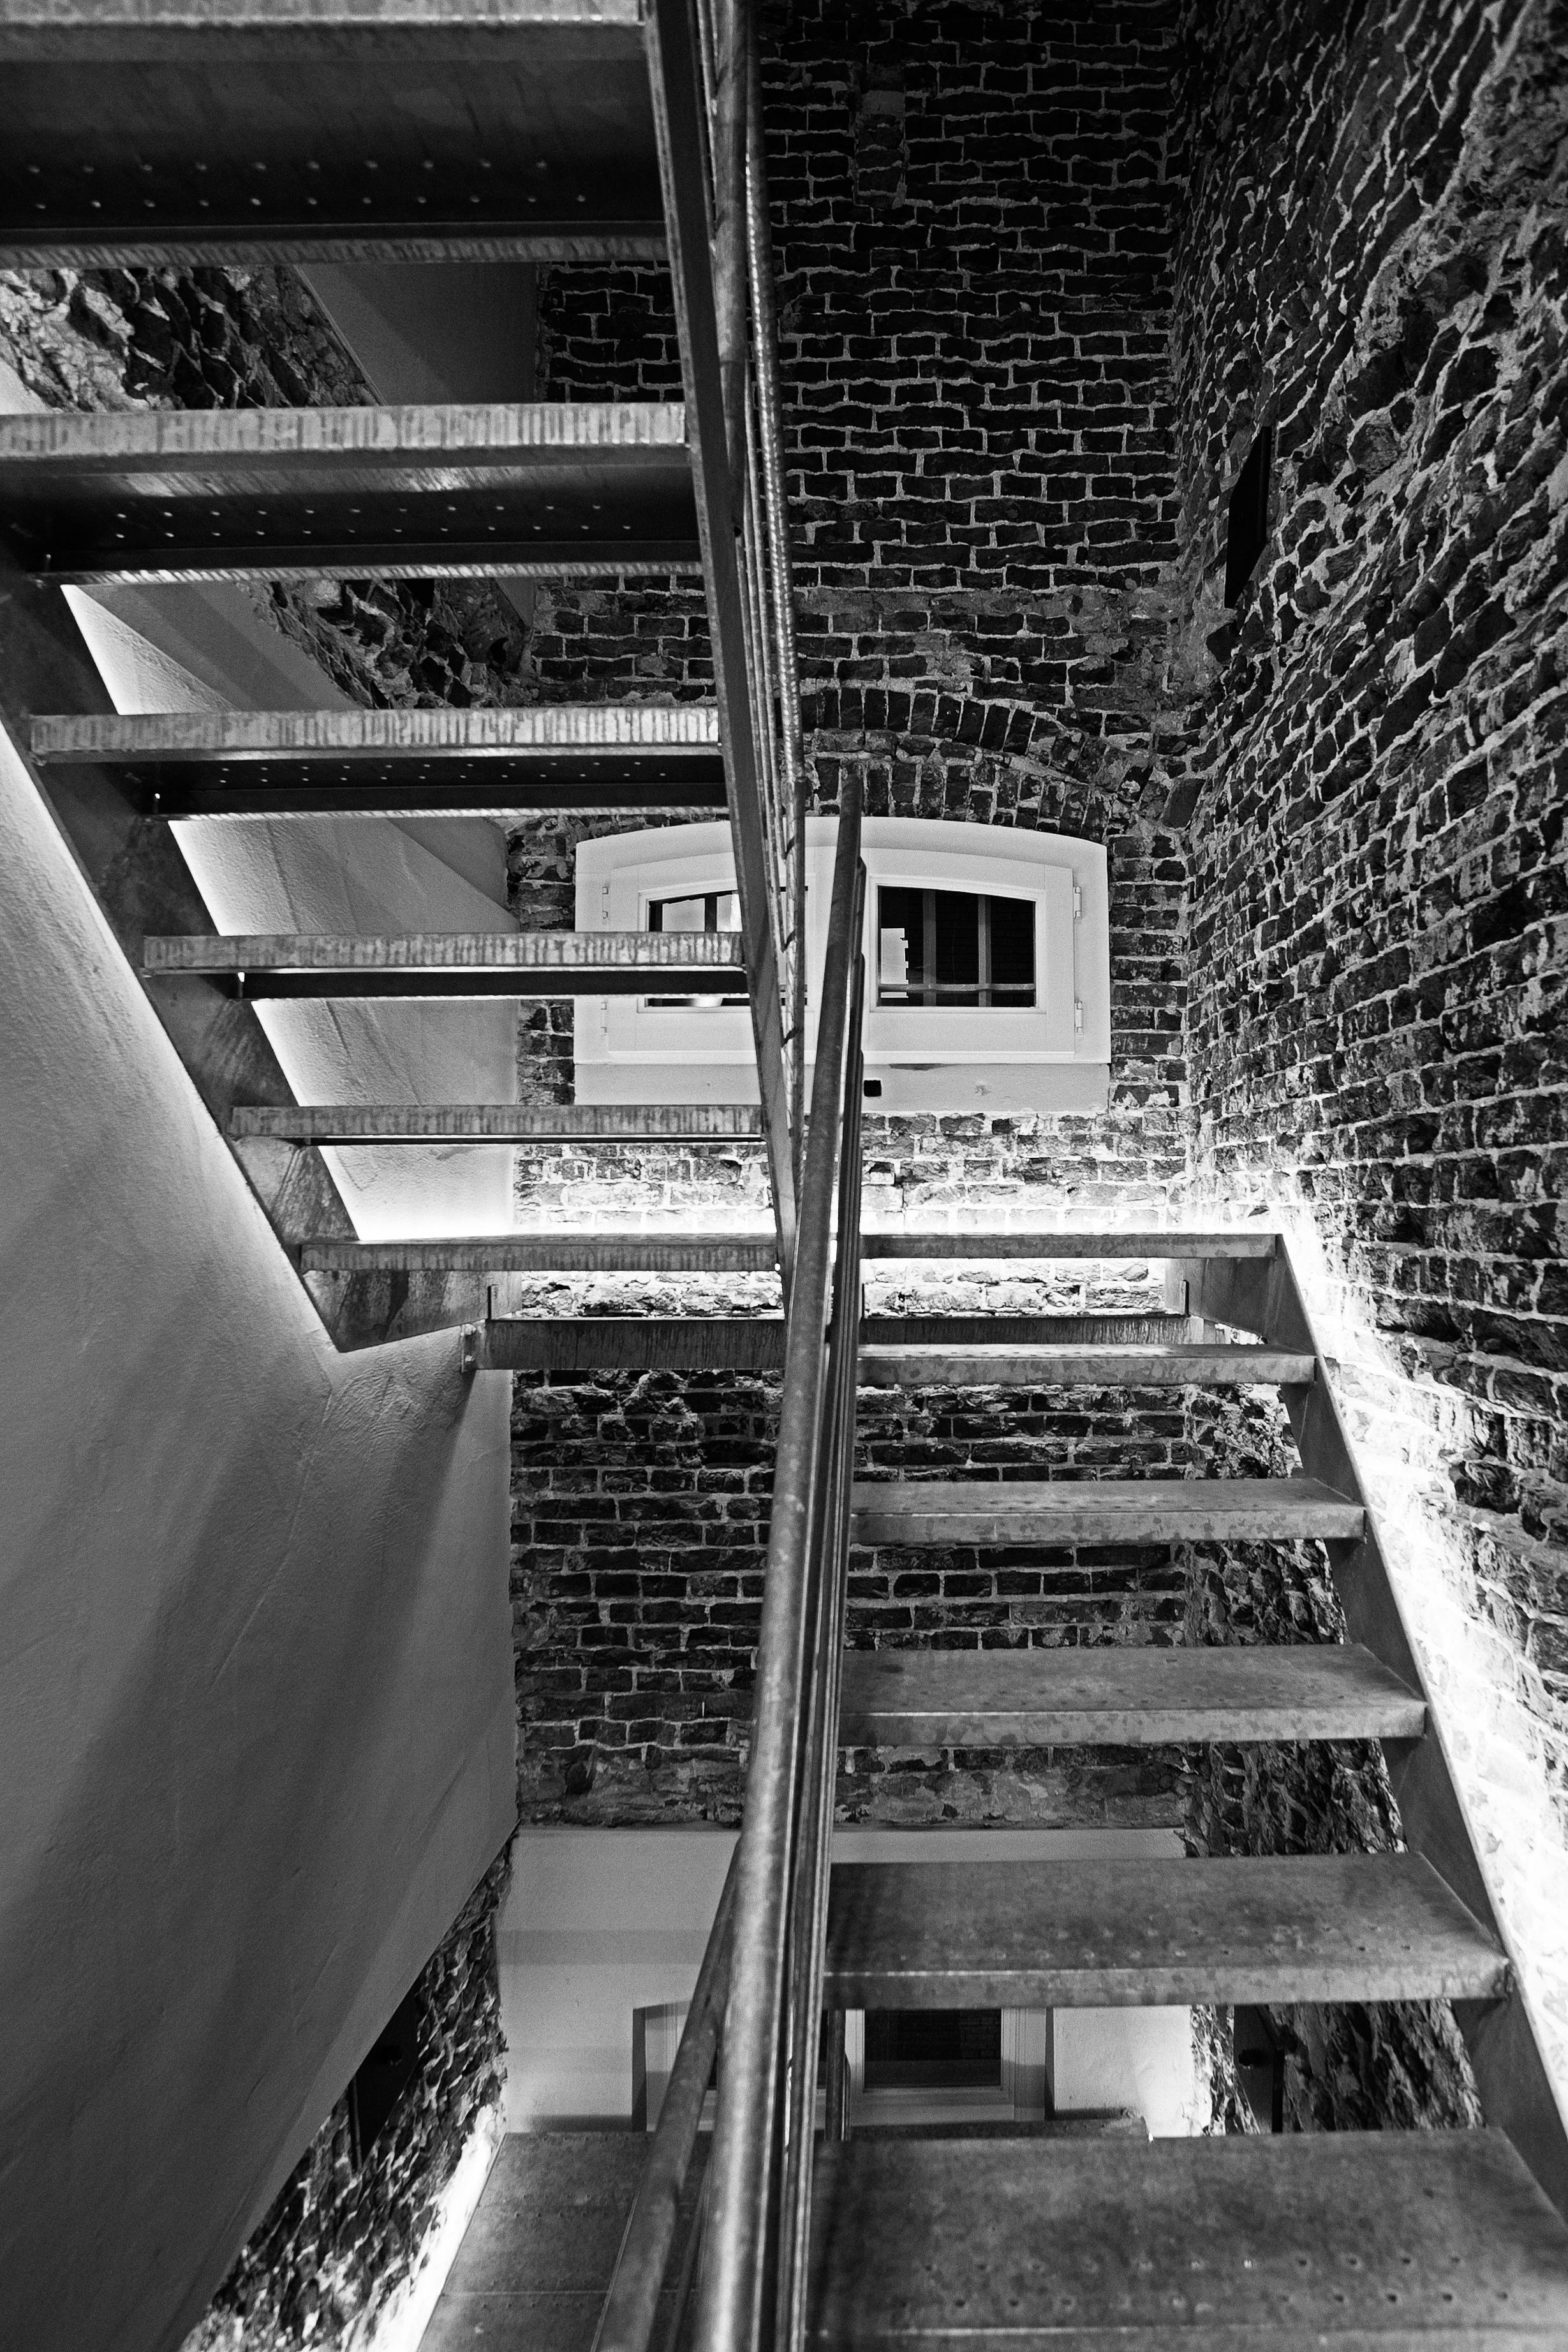 Archi.int_Het_Arresthuis_20110509_0068_HDR10-Edit.jpg